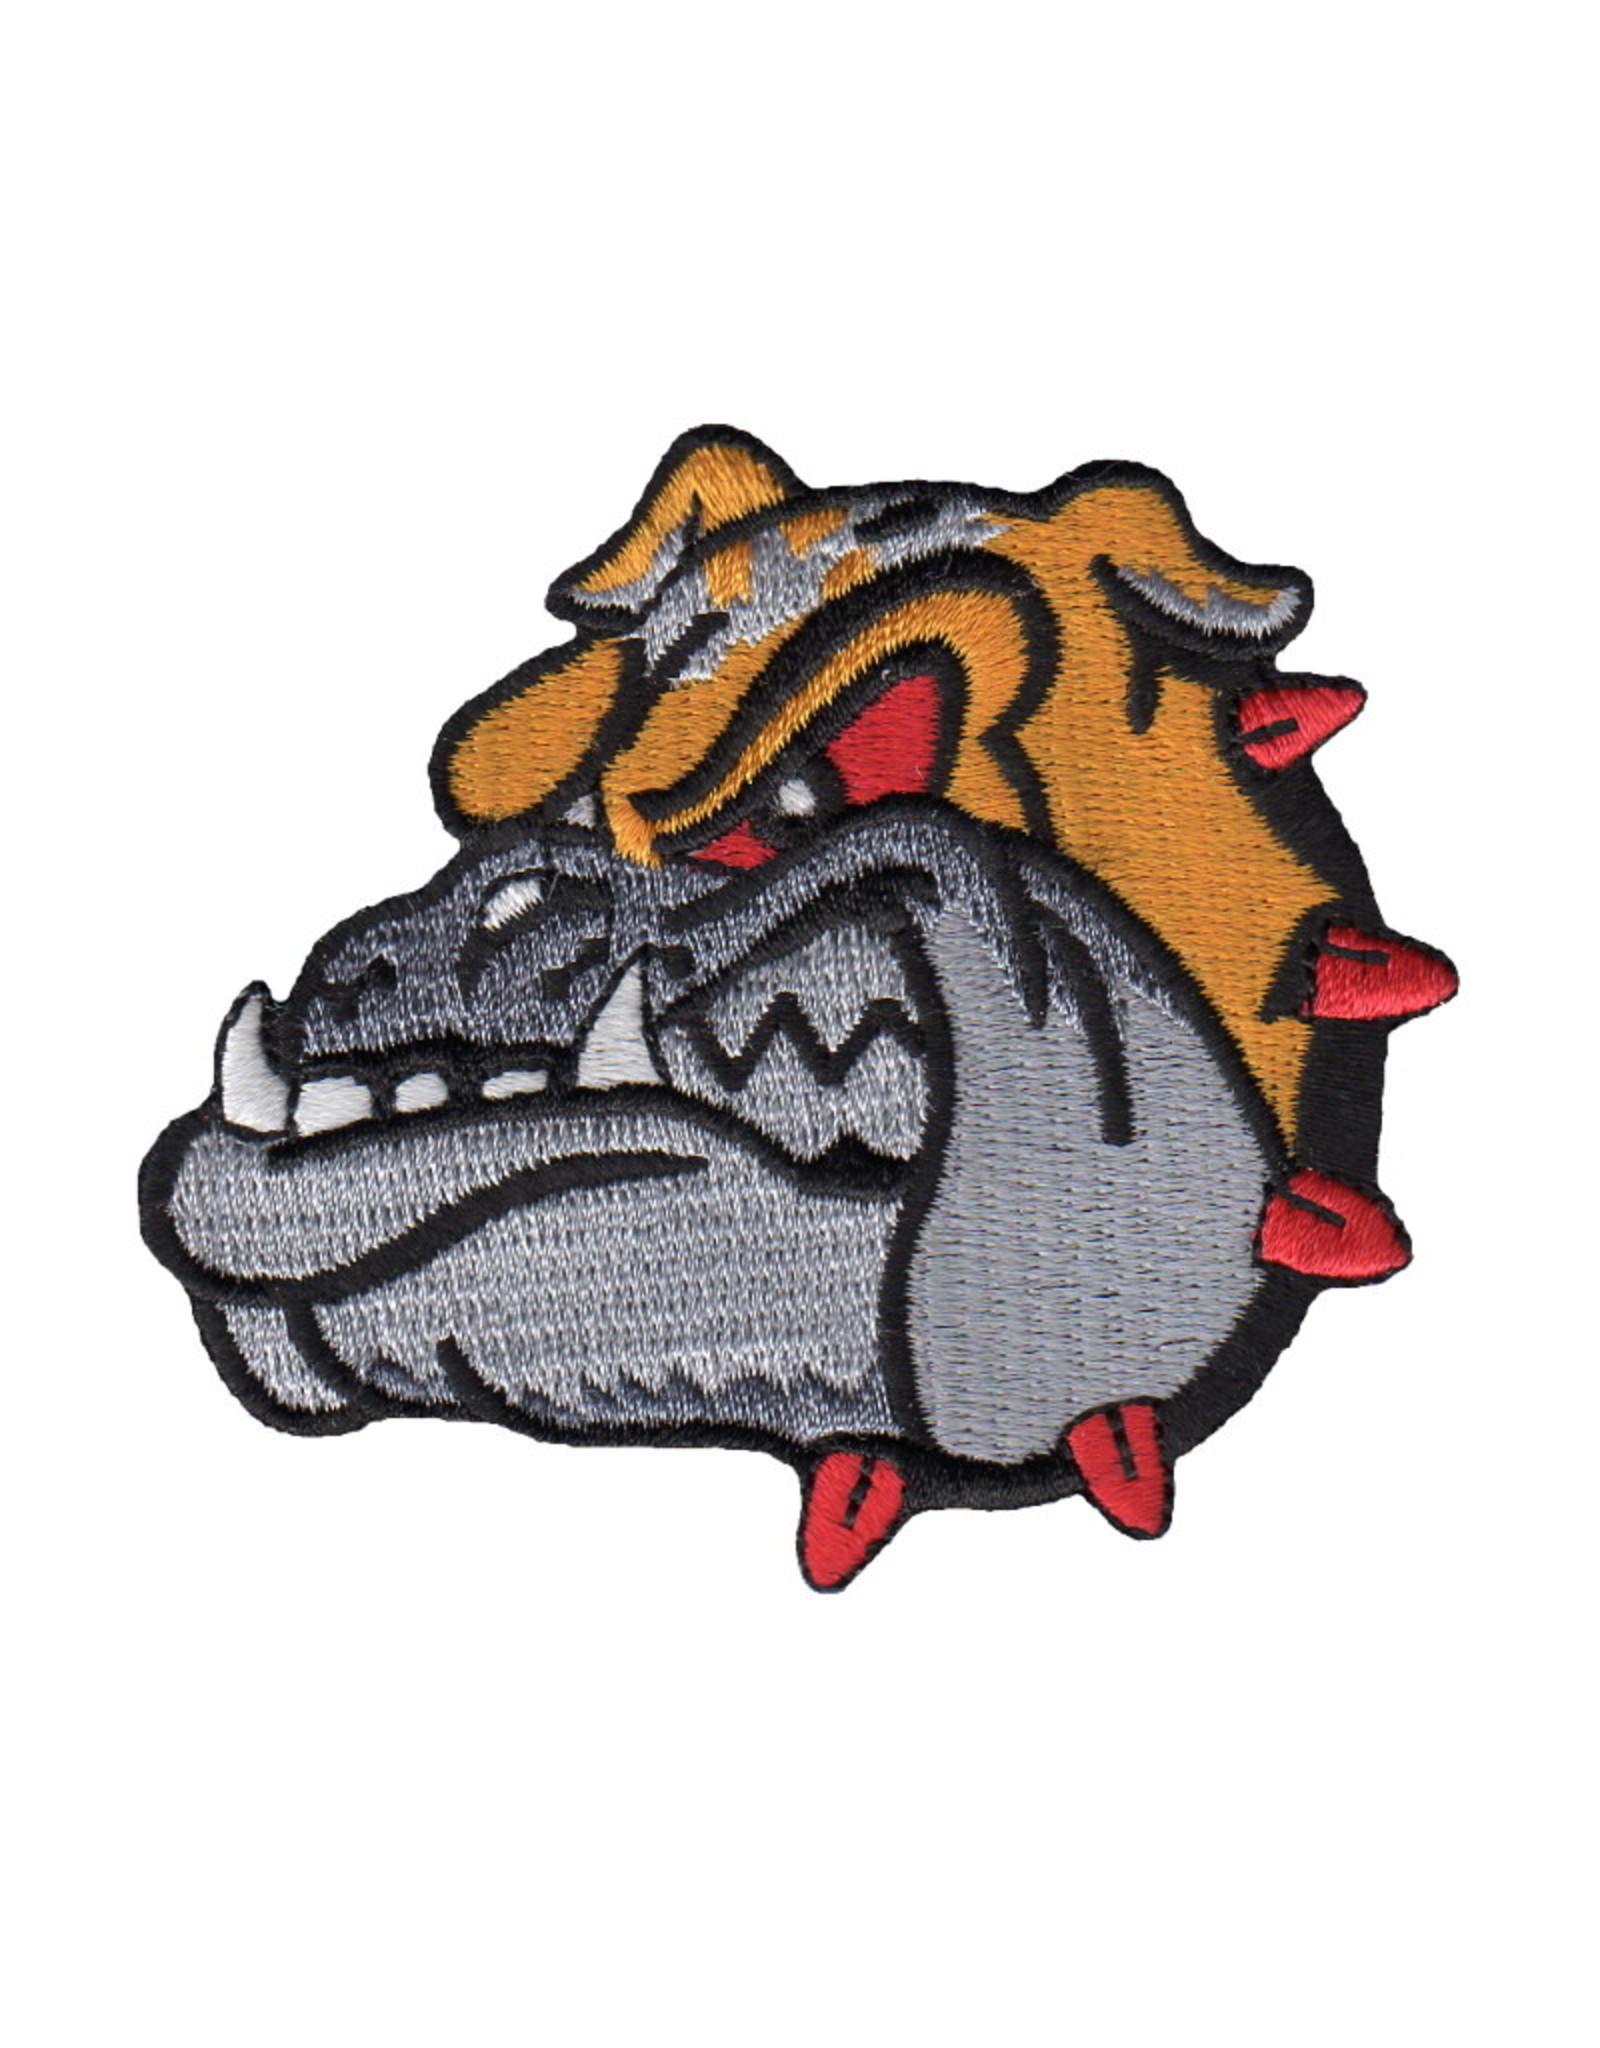 "MidMil Embroidered Marine Devildog Patch 3"" wide x 2.7"" high"